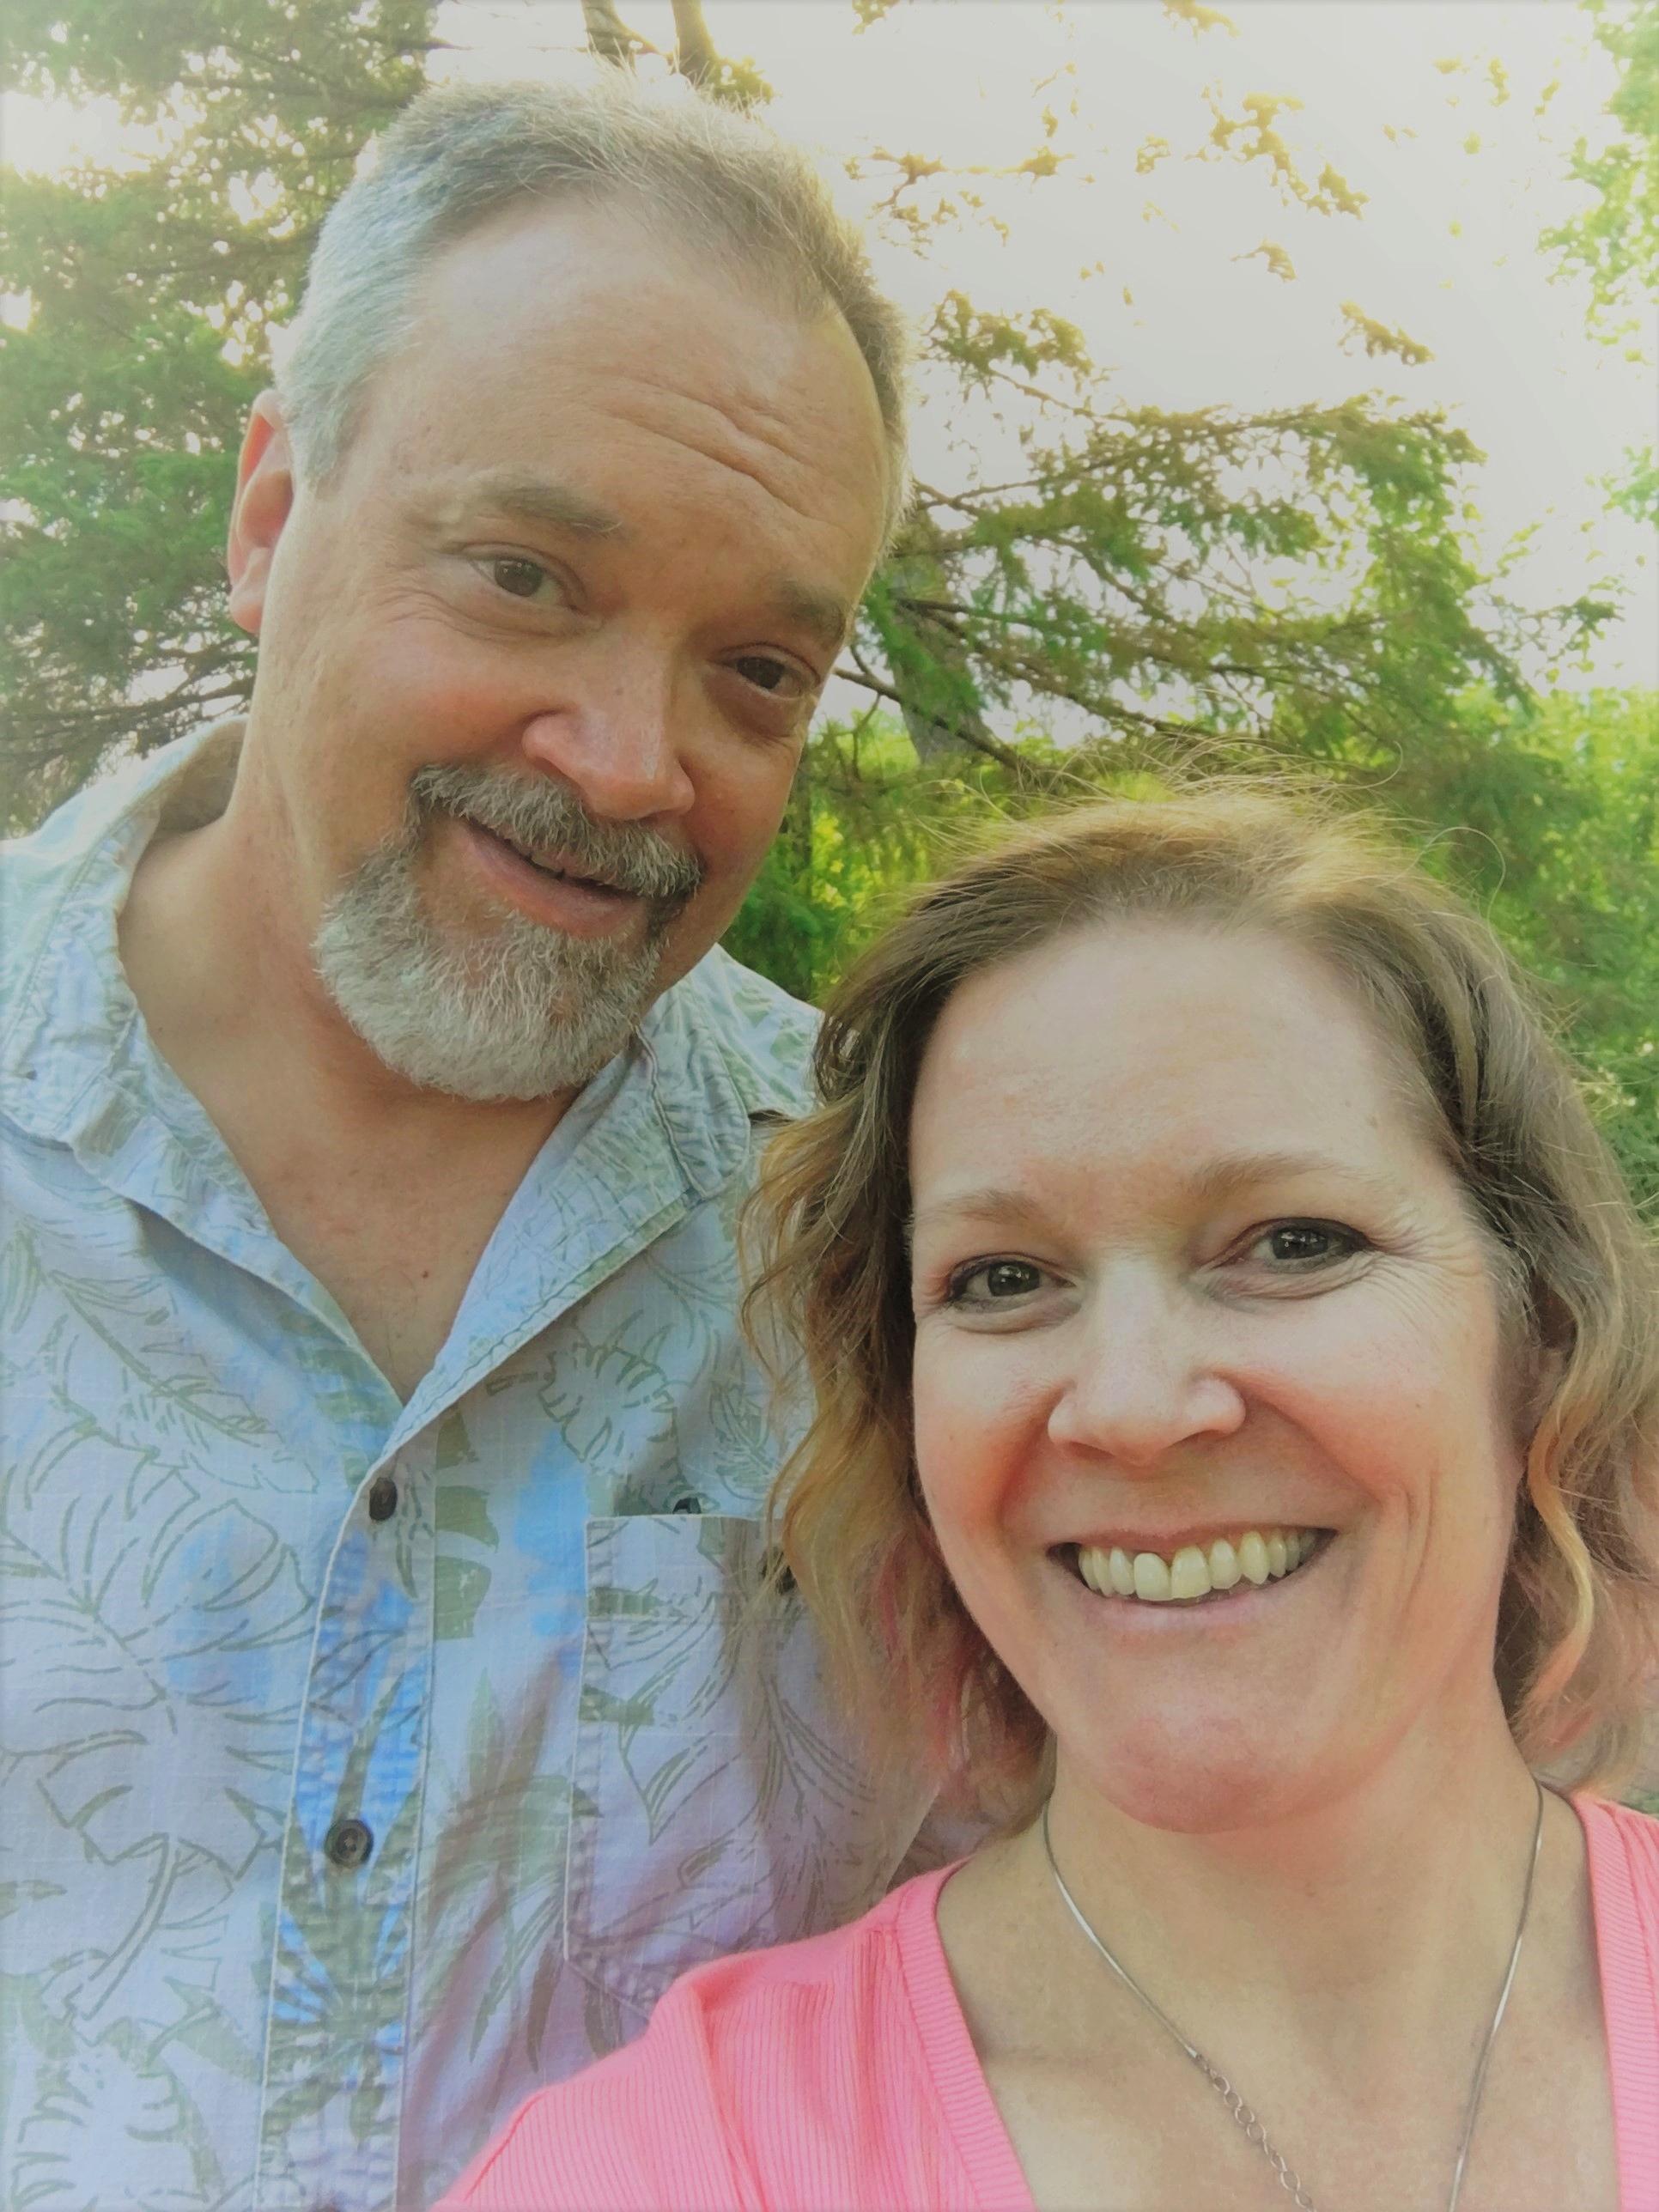 Jeremy and Kimberly - married 12/31/93